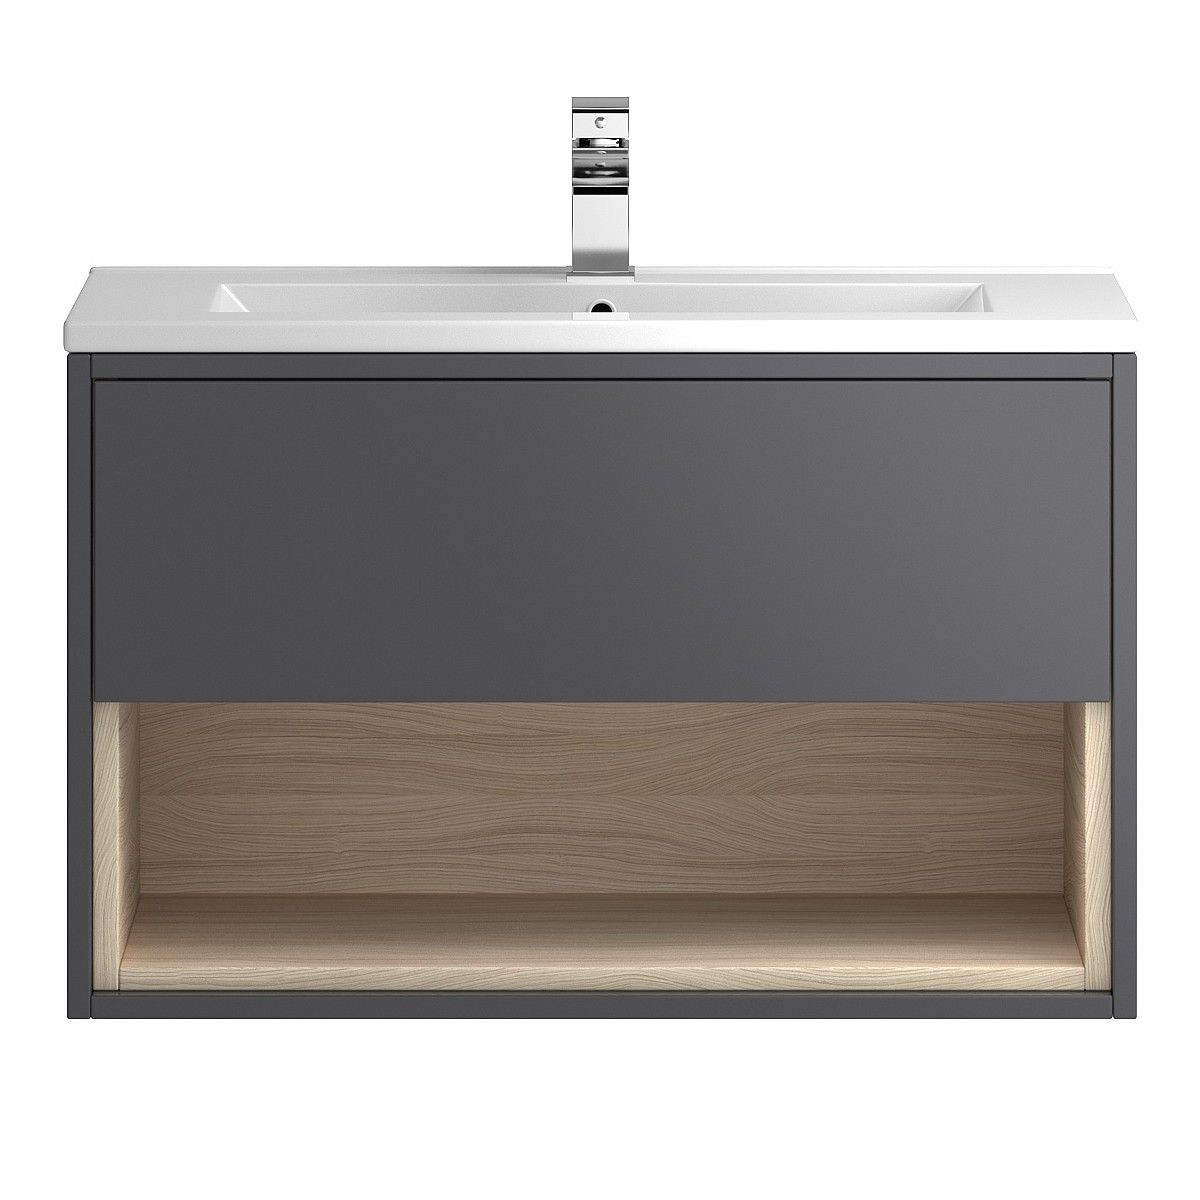 Coast Designer 800mm Grey Gloss Bathroom Vanity Unit Main Image